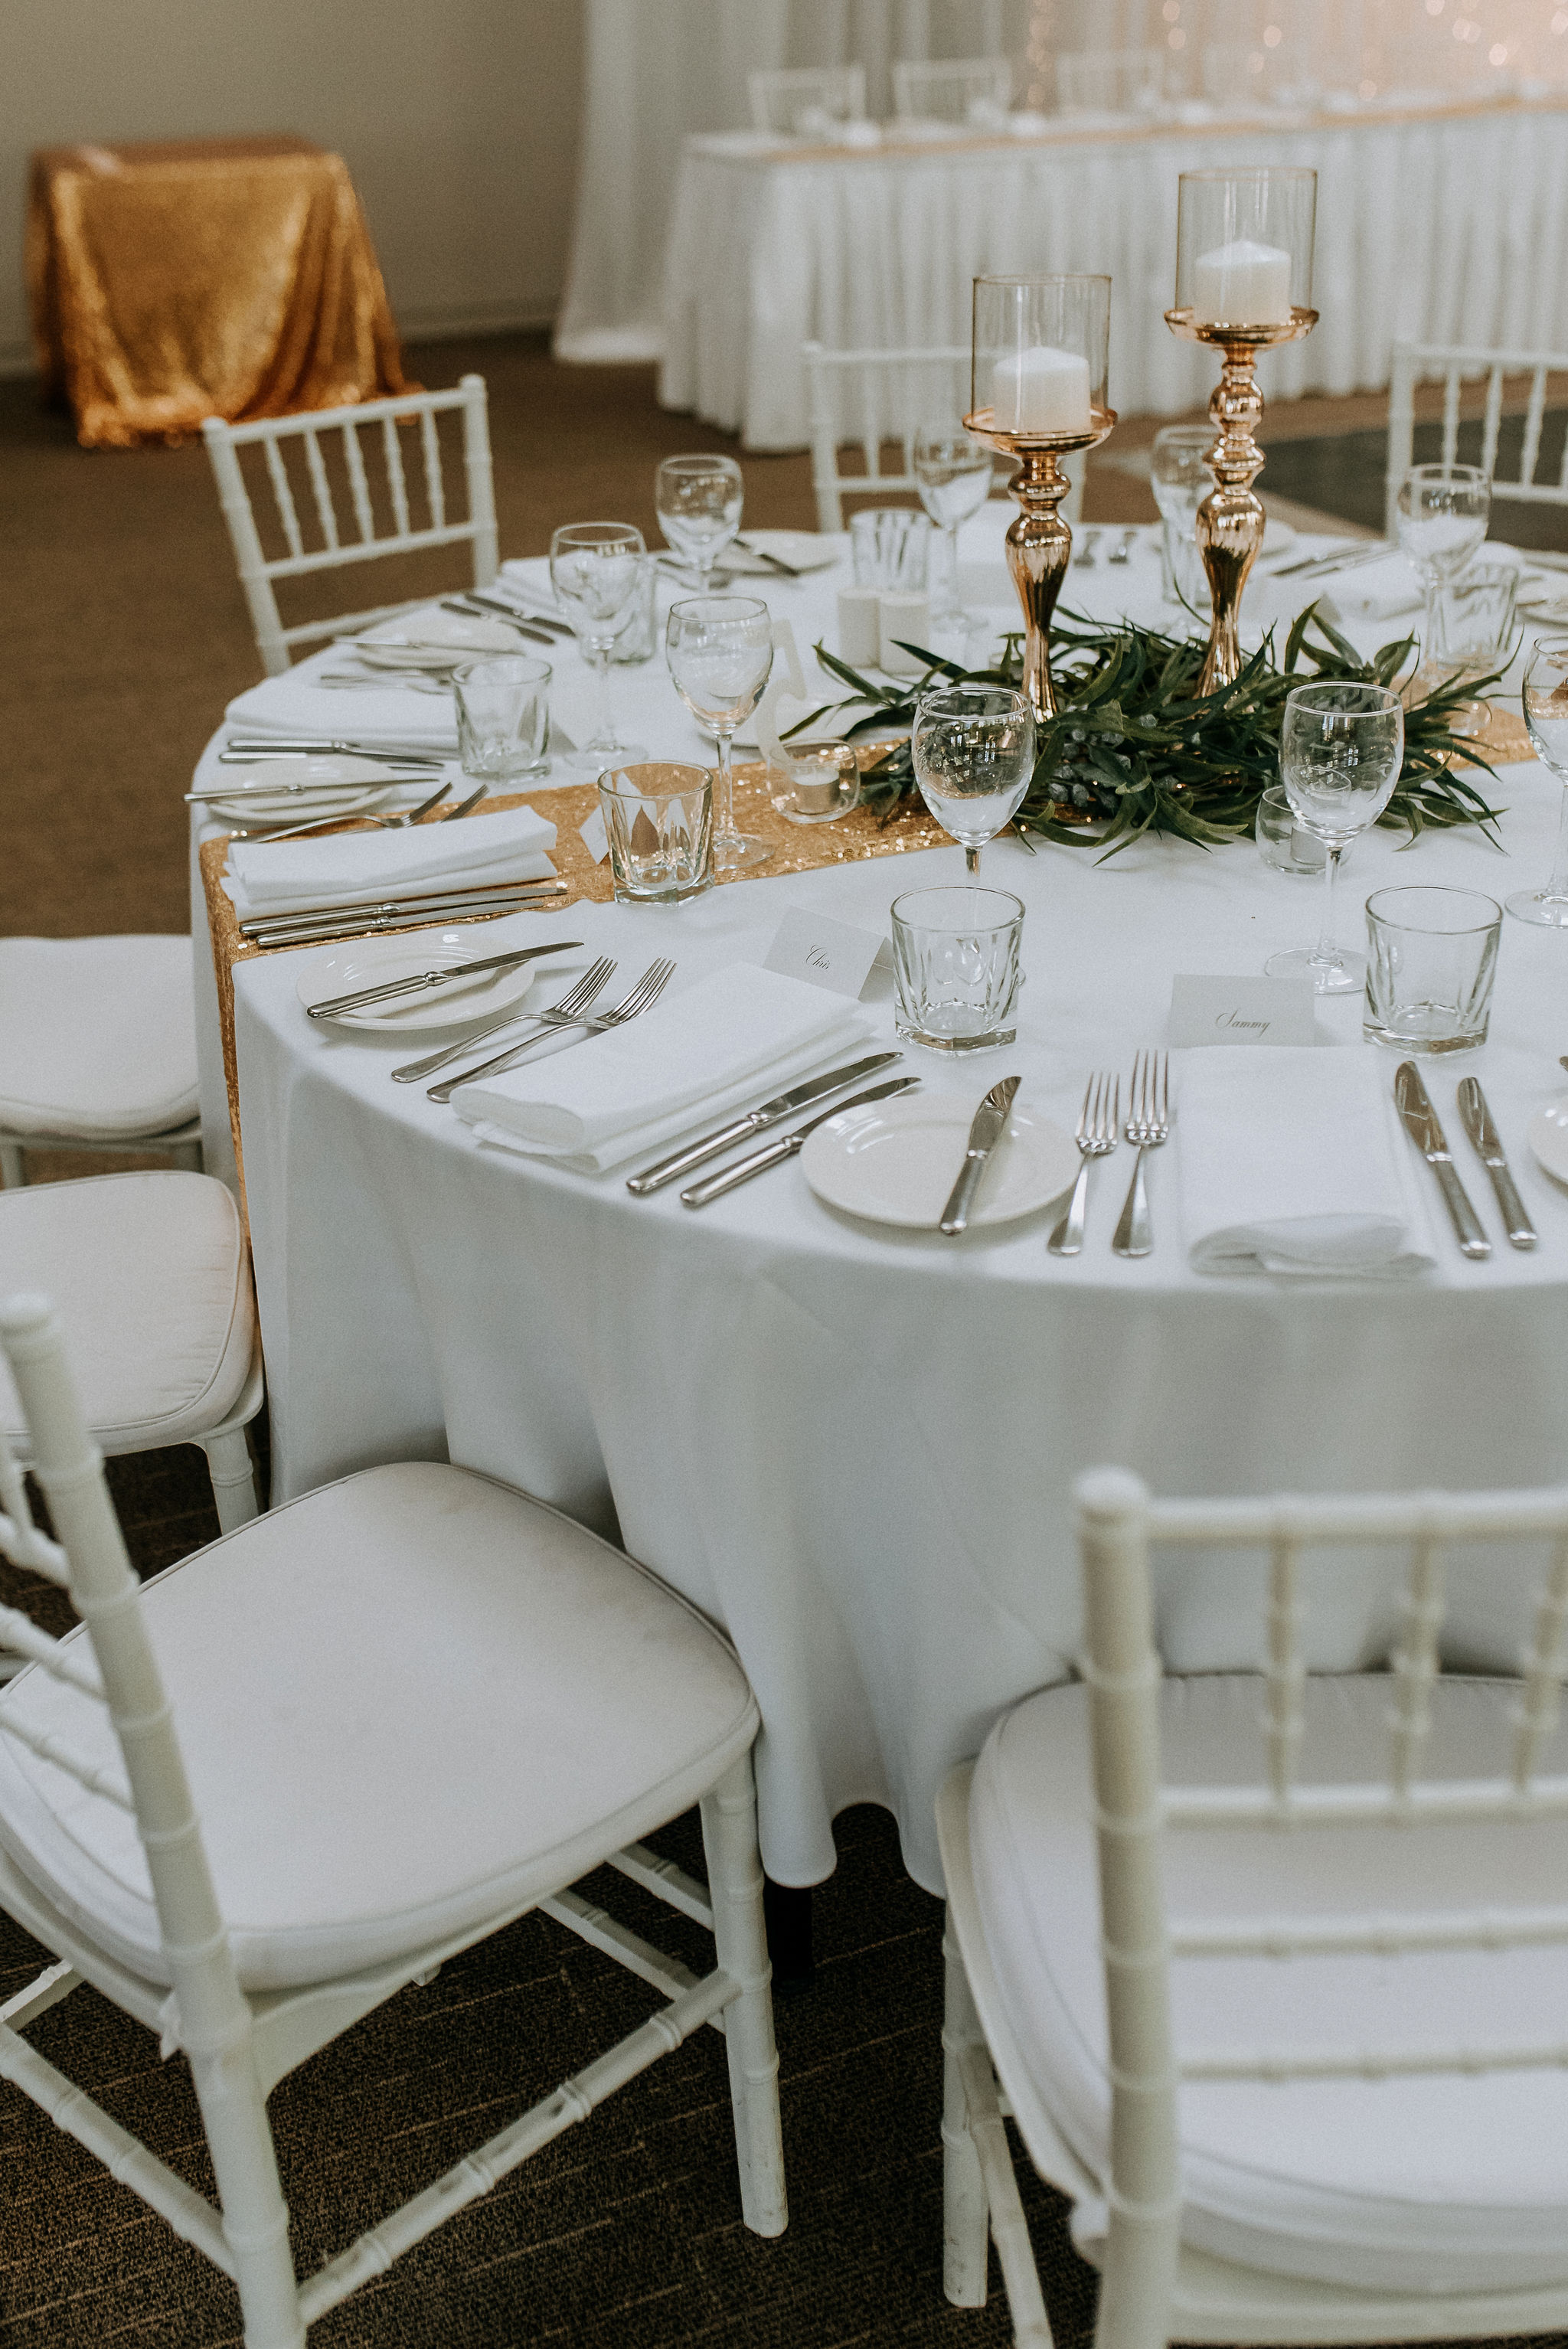 CAVES-BEACH-HOTEL-WEDDING-PATTEN-164.jpg